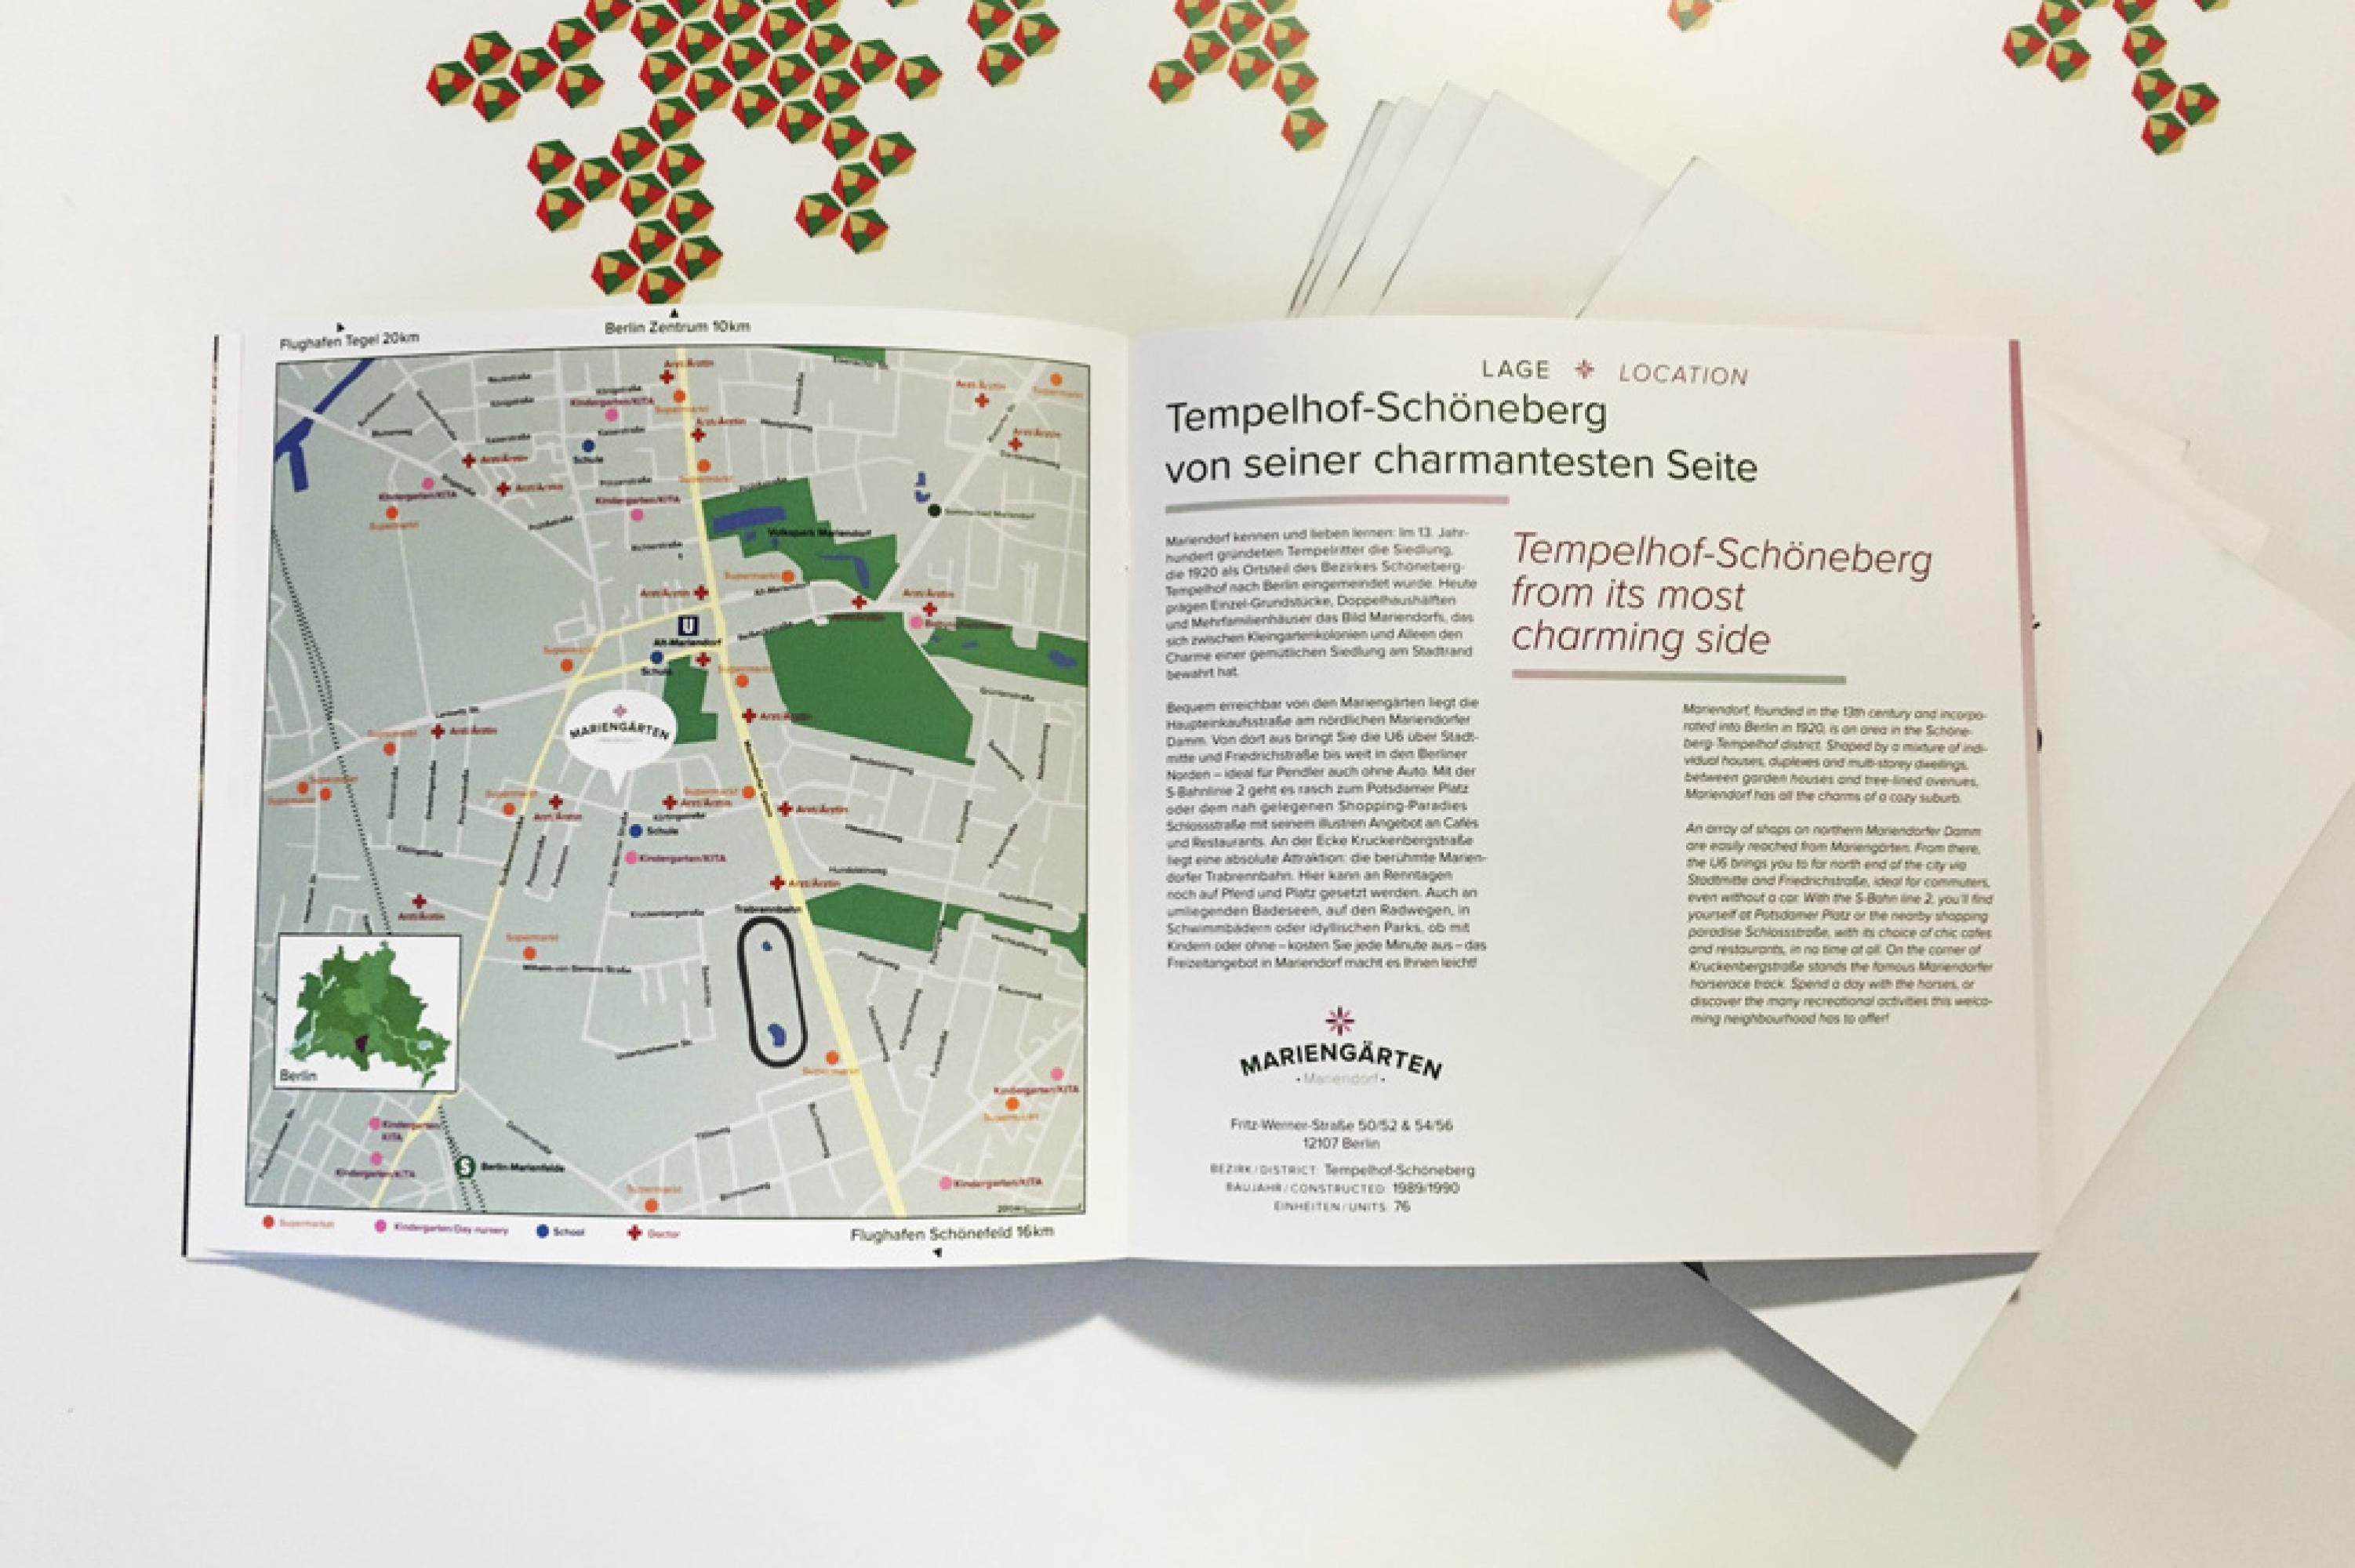 Mairengaerten-formlos-berlin-print-2